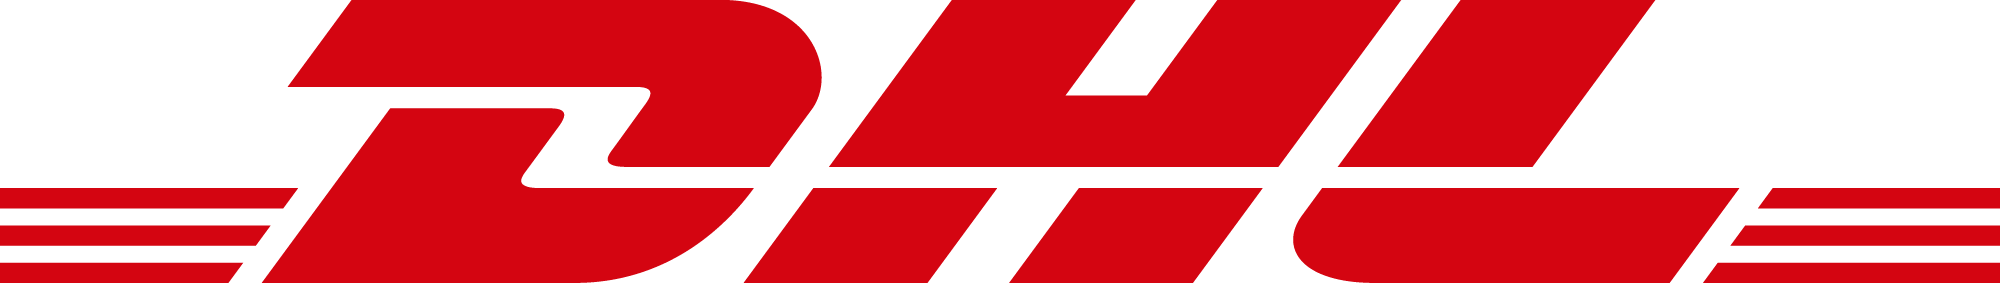 Eden Project Logo